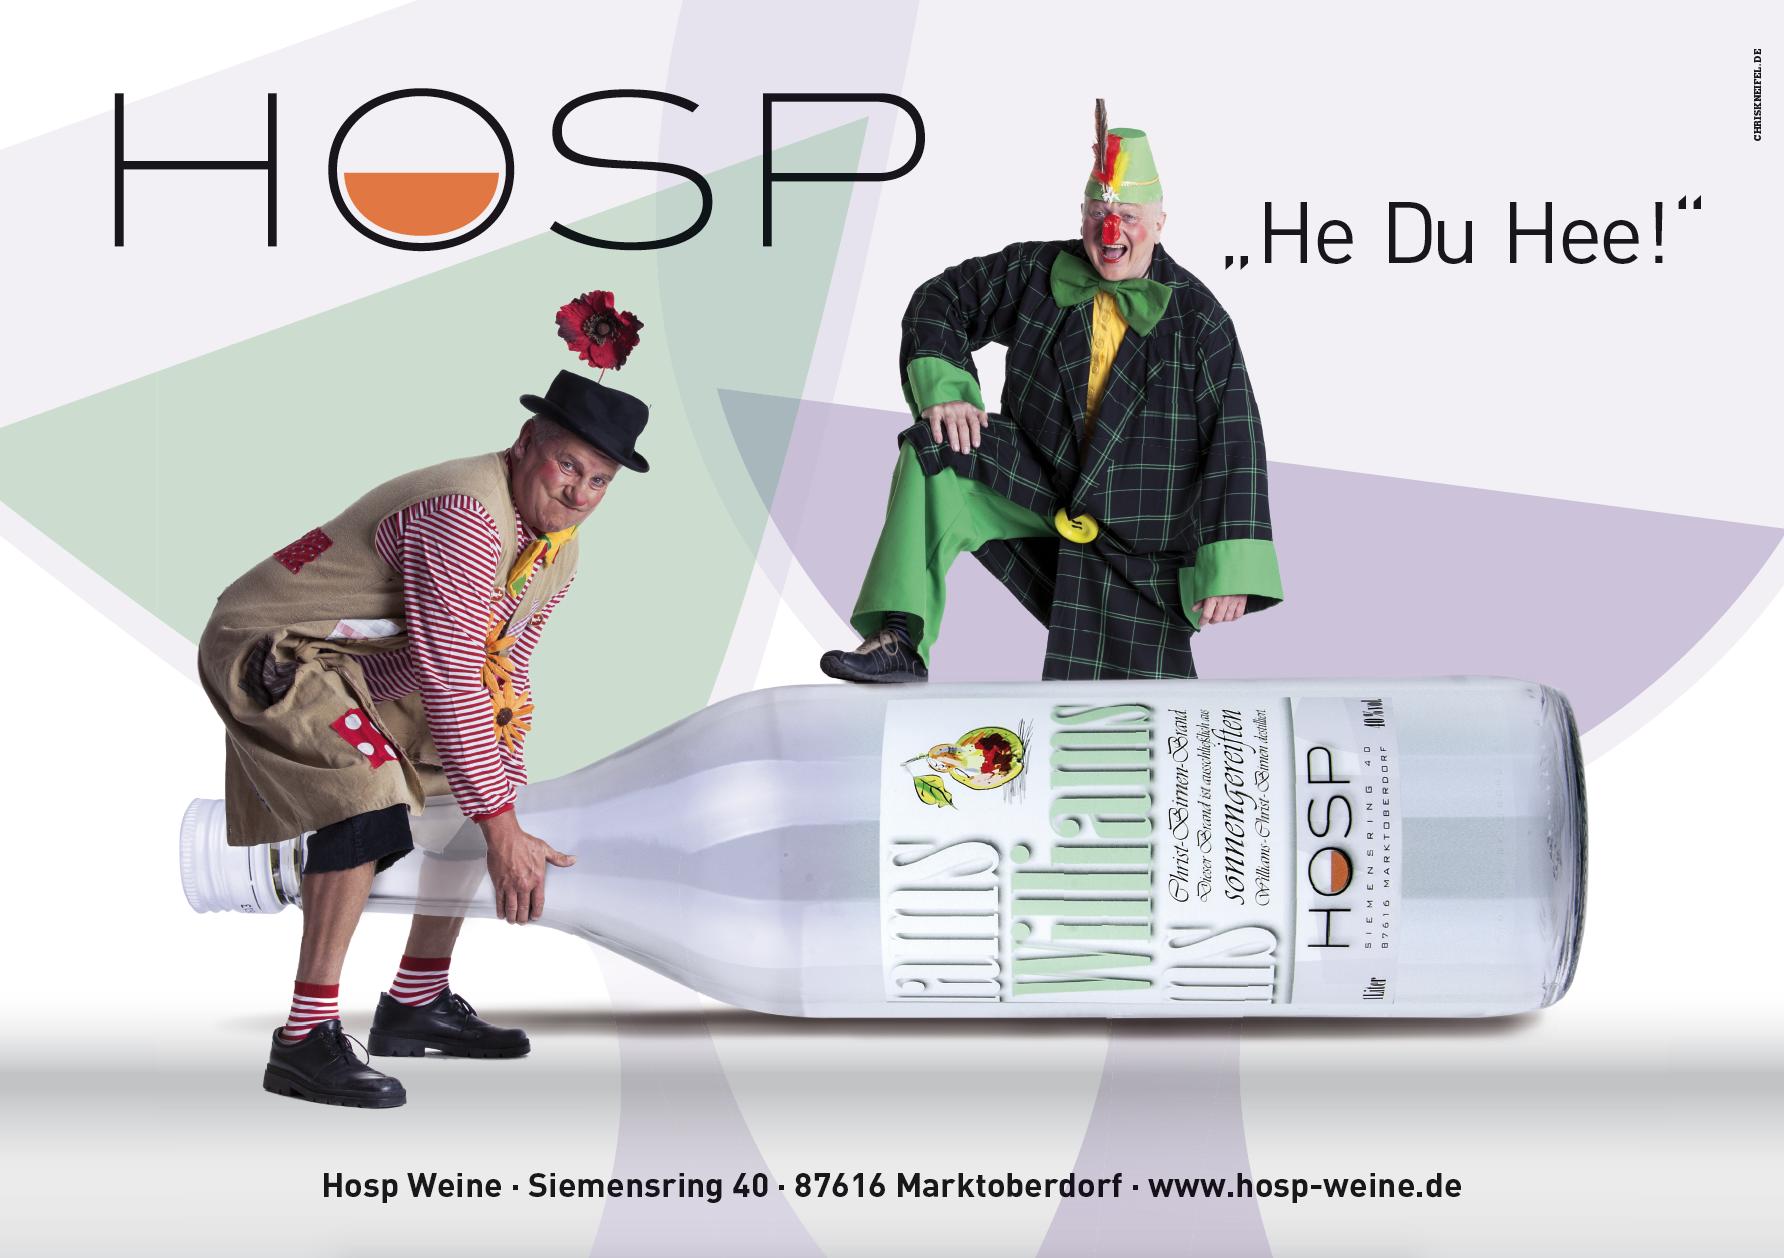 HOSP Weine, Faschingsplakat